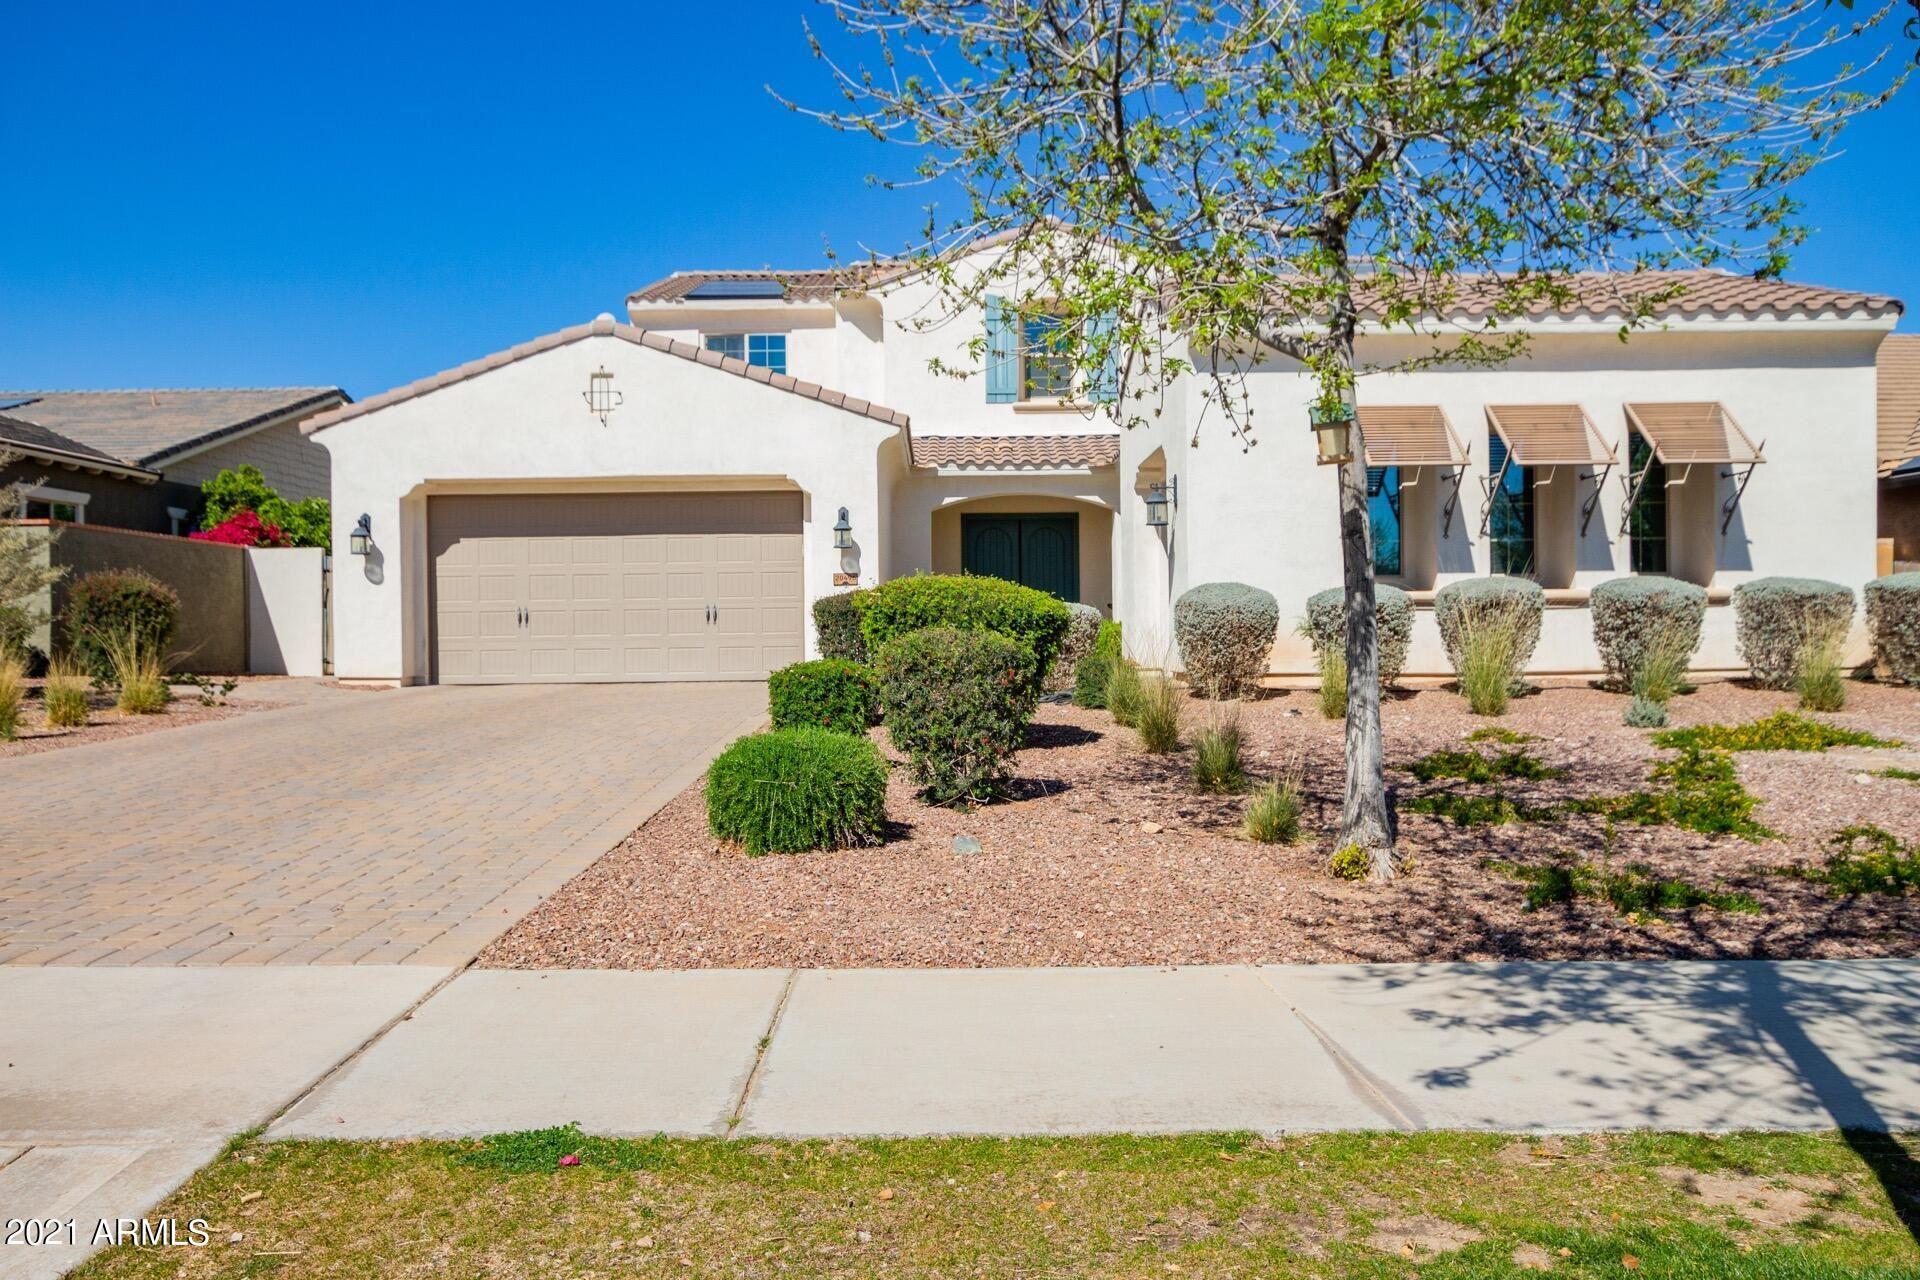 Photo of 20496 W HAMILTON Street, Buckeye, AZ 85396 (MLS # 6200163)